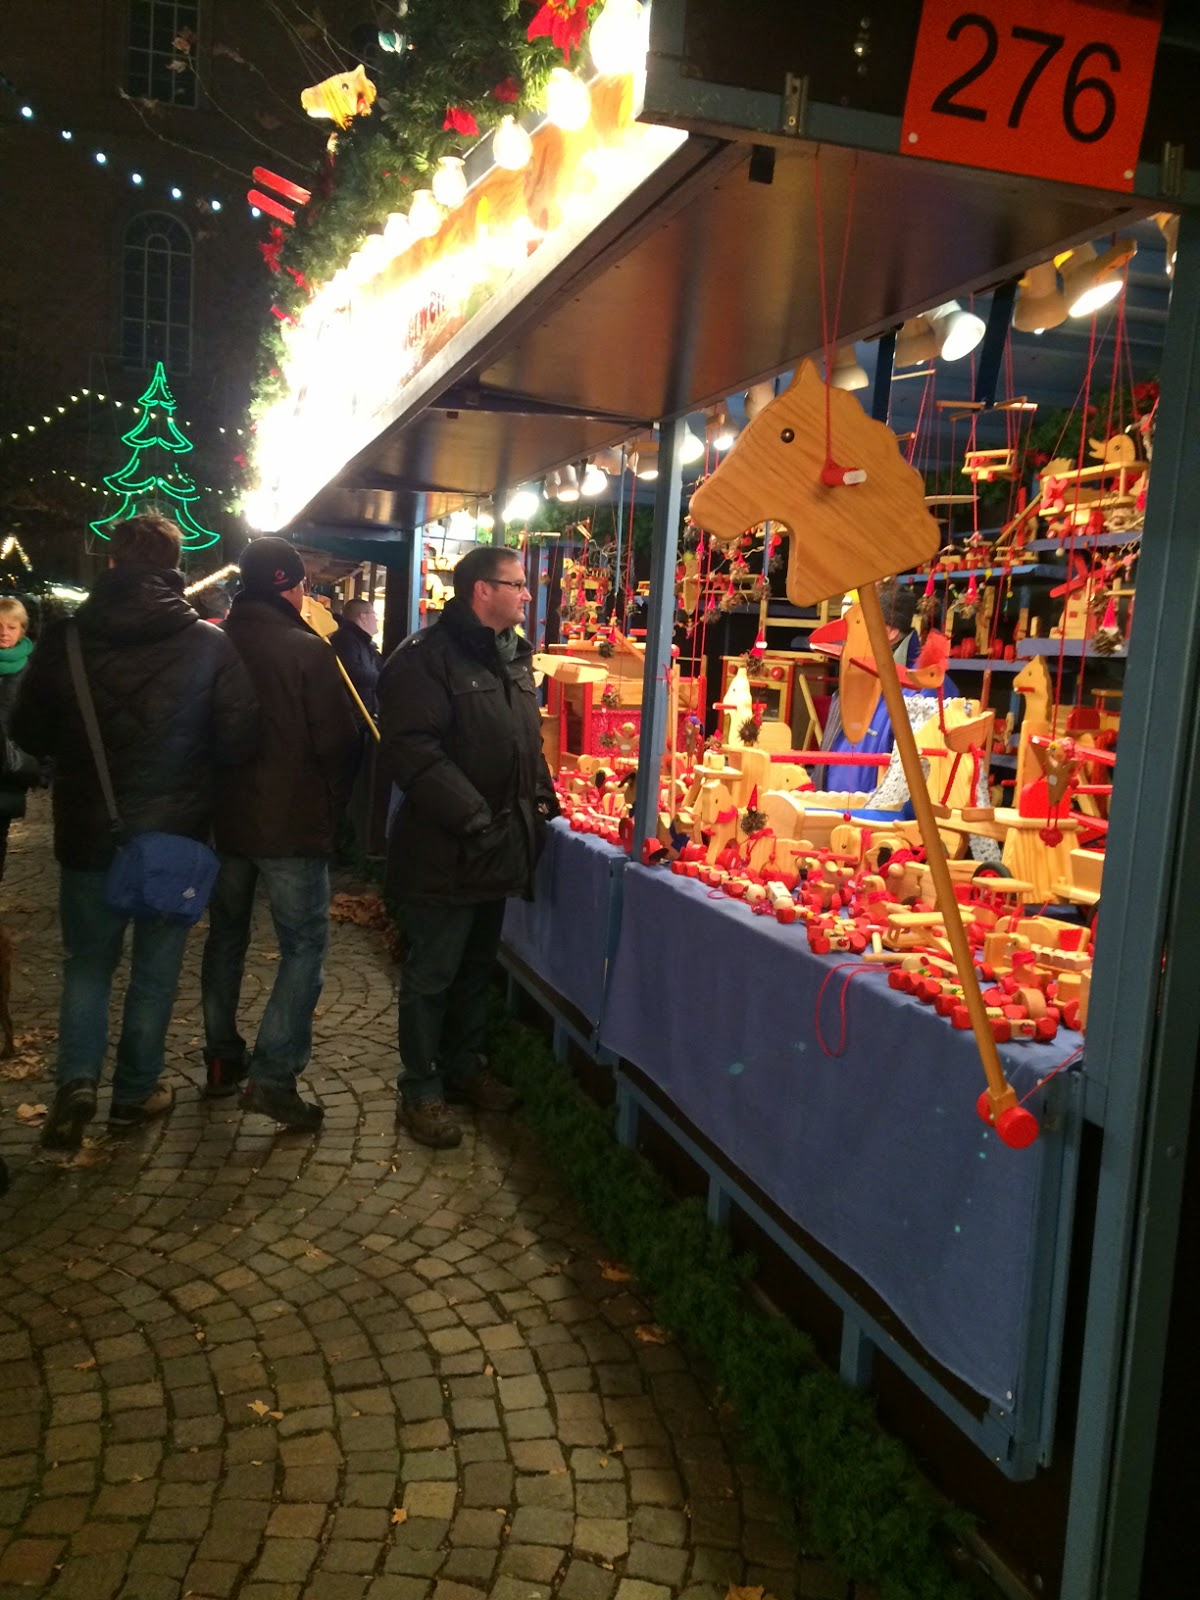 Mercado navideño en Frankfurt